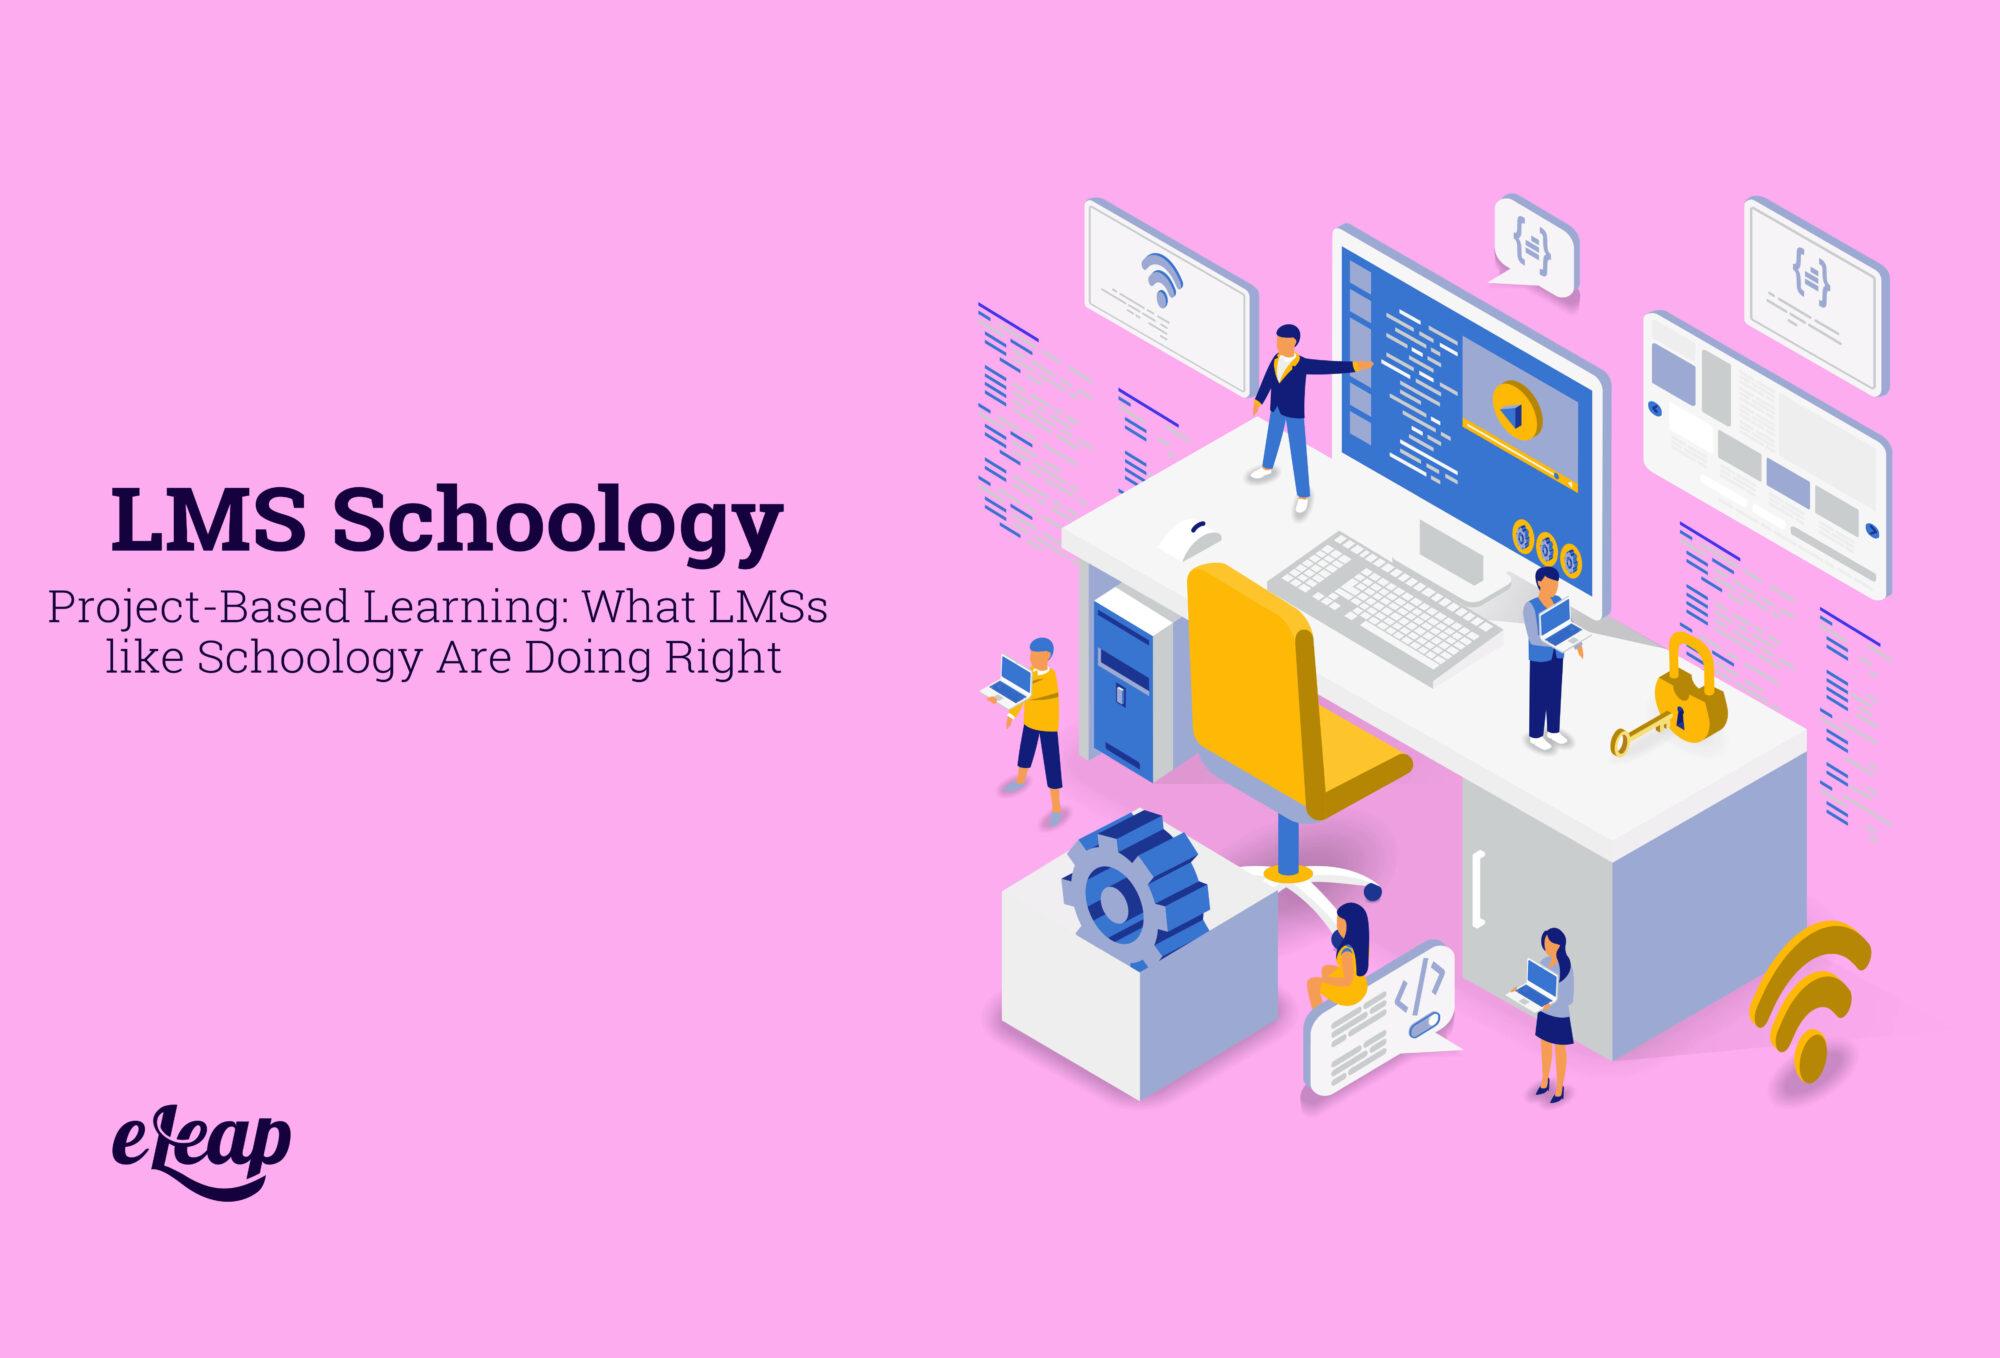 LMS Schoology